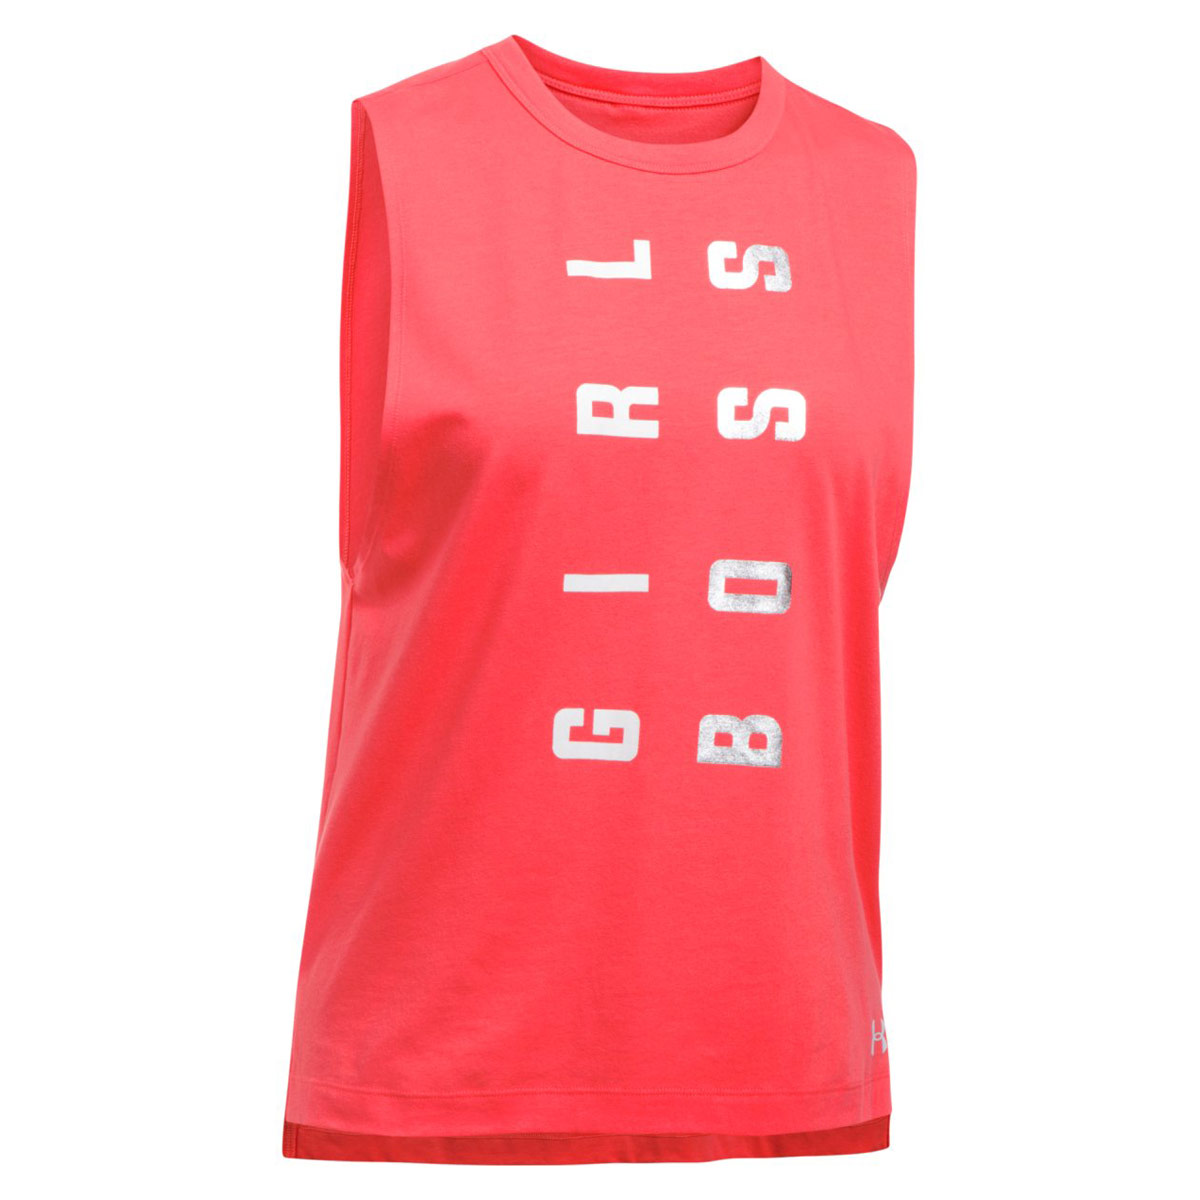 45ba9824 Under Armour Muscle Tank Girl Boss - Fitness tops for Women - Red | 21RUN